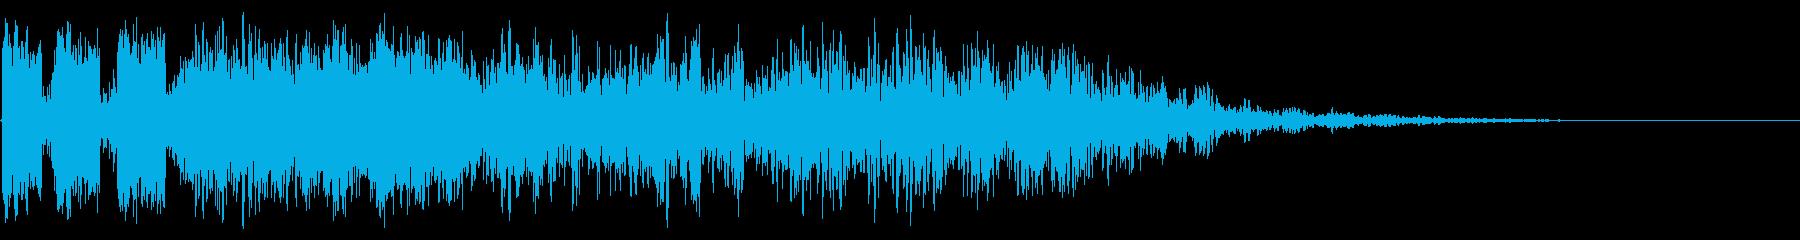 ZAP WHOOSHの再生済みの波形